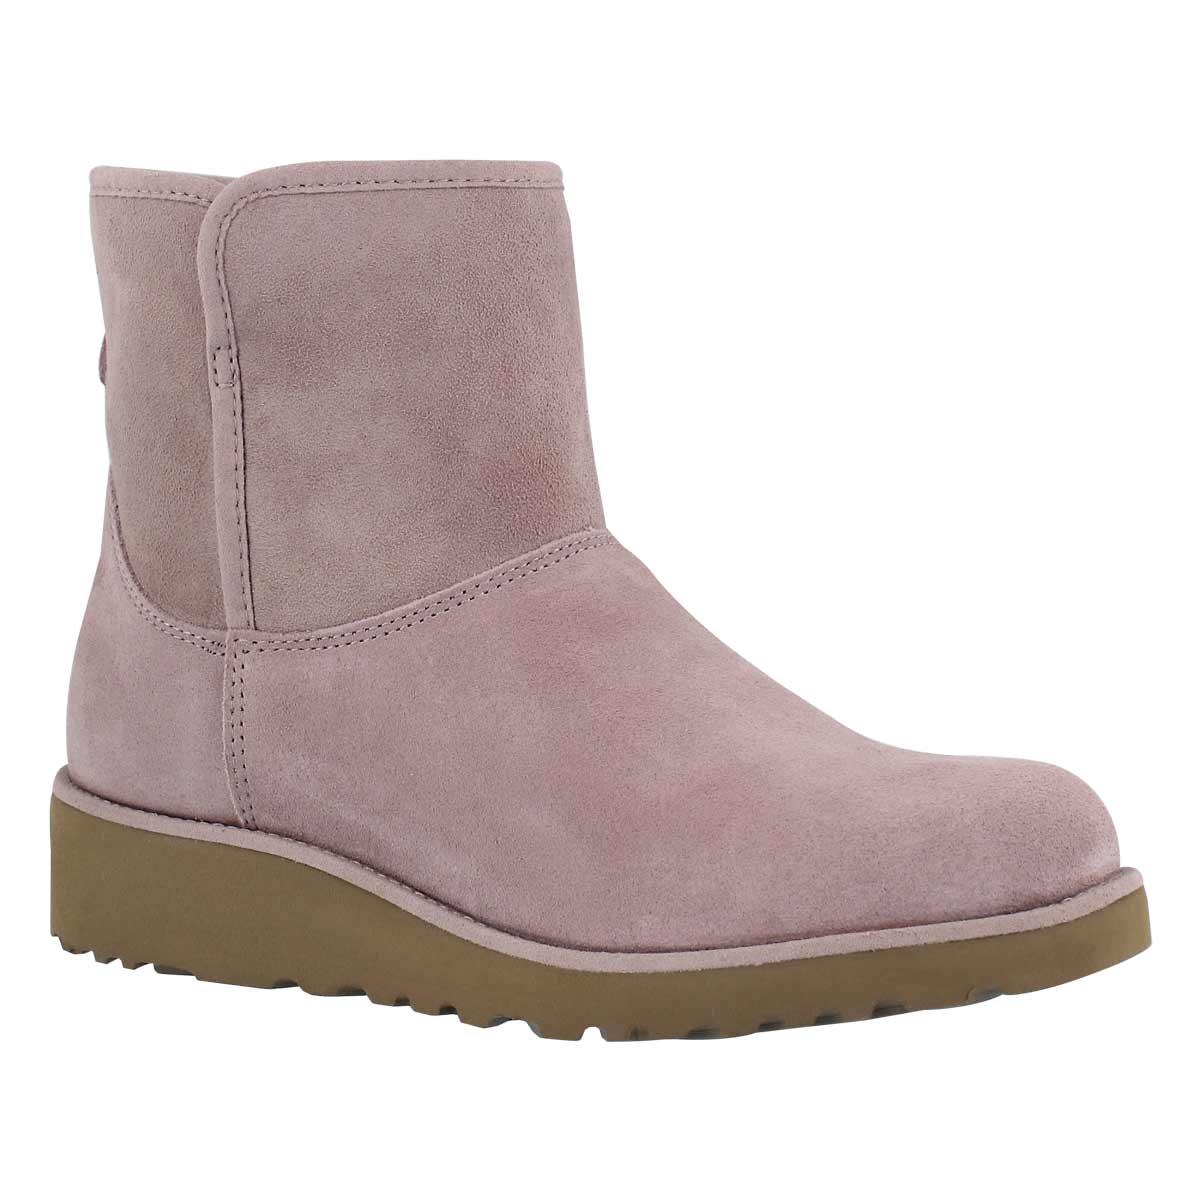 Women's KRISTIN dusk wedge sheepskin boots